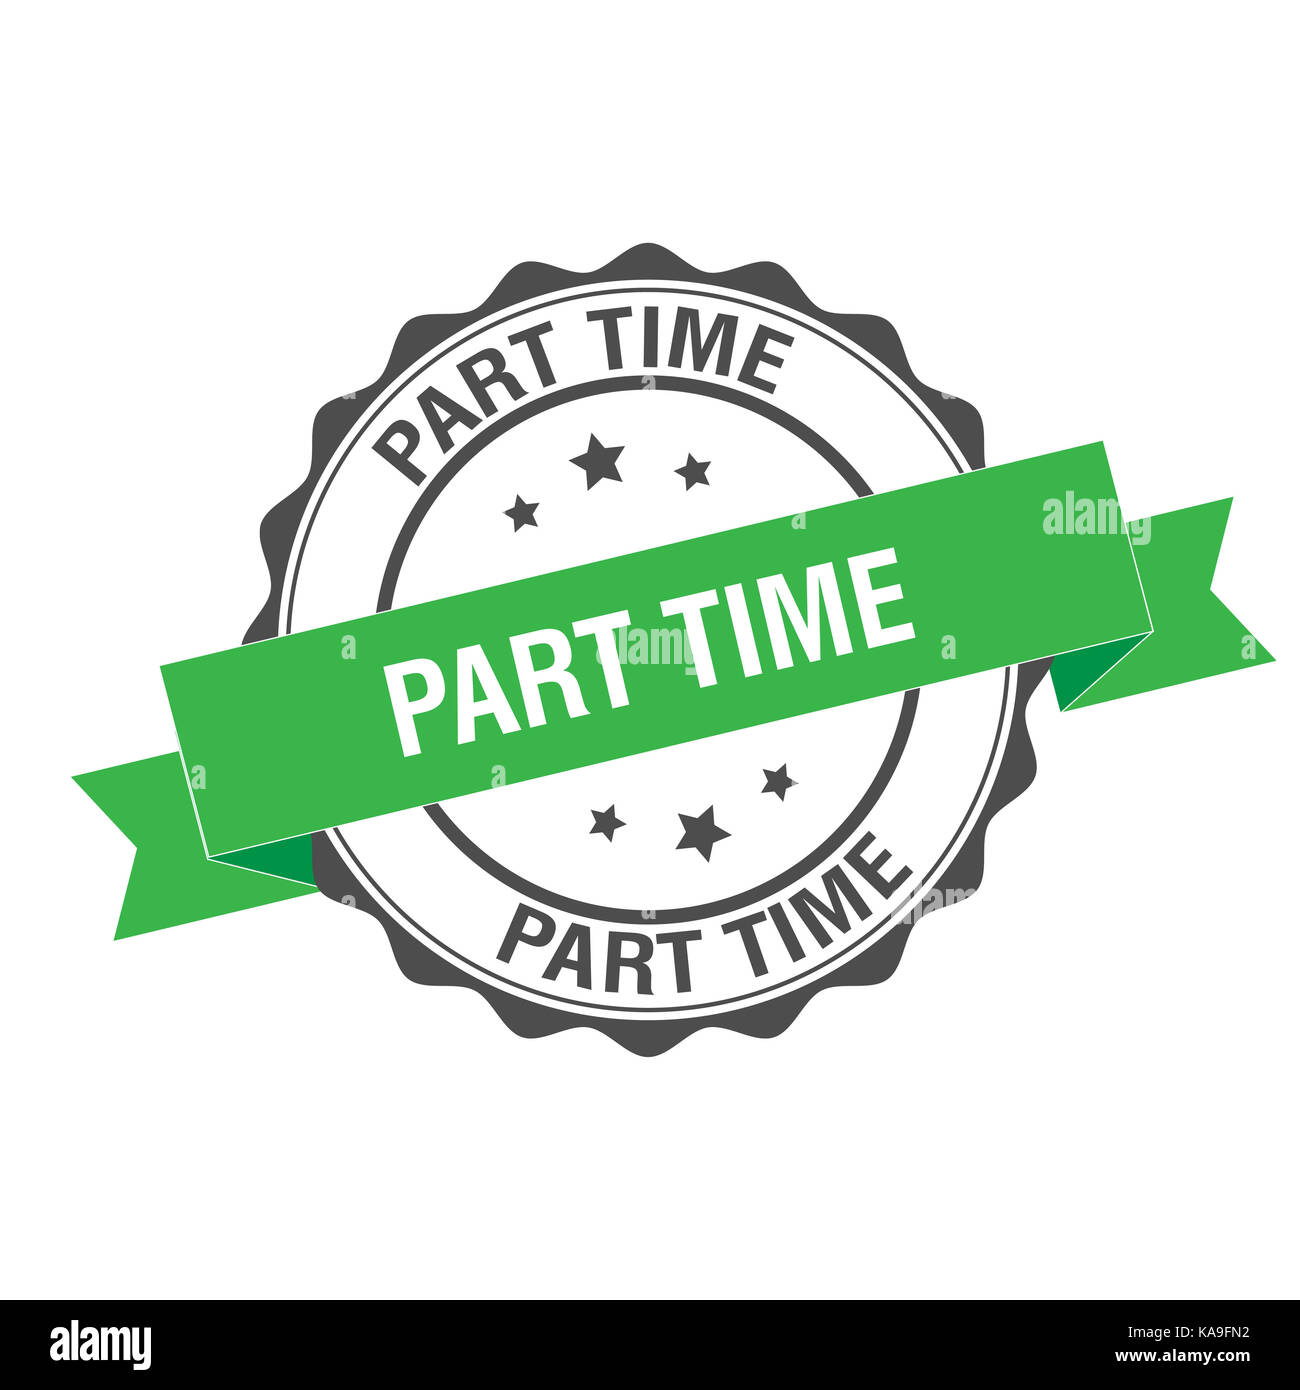 Part time stamp illustration - Stock Image